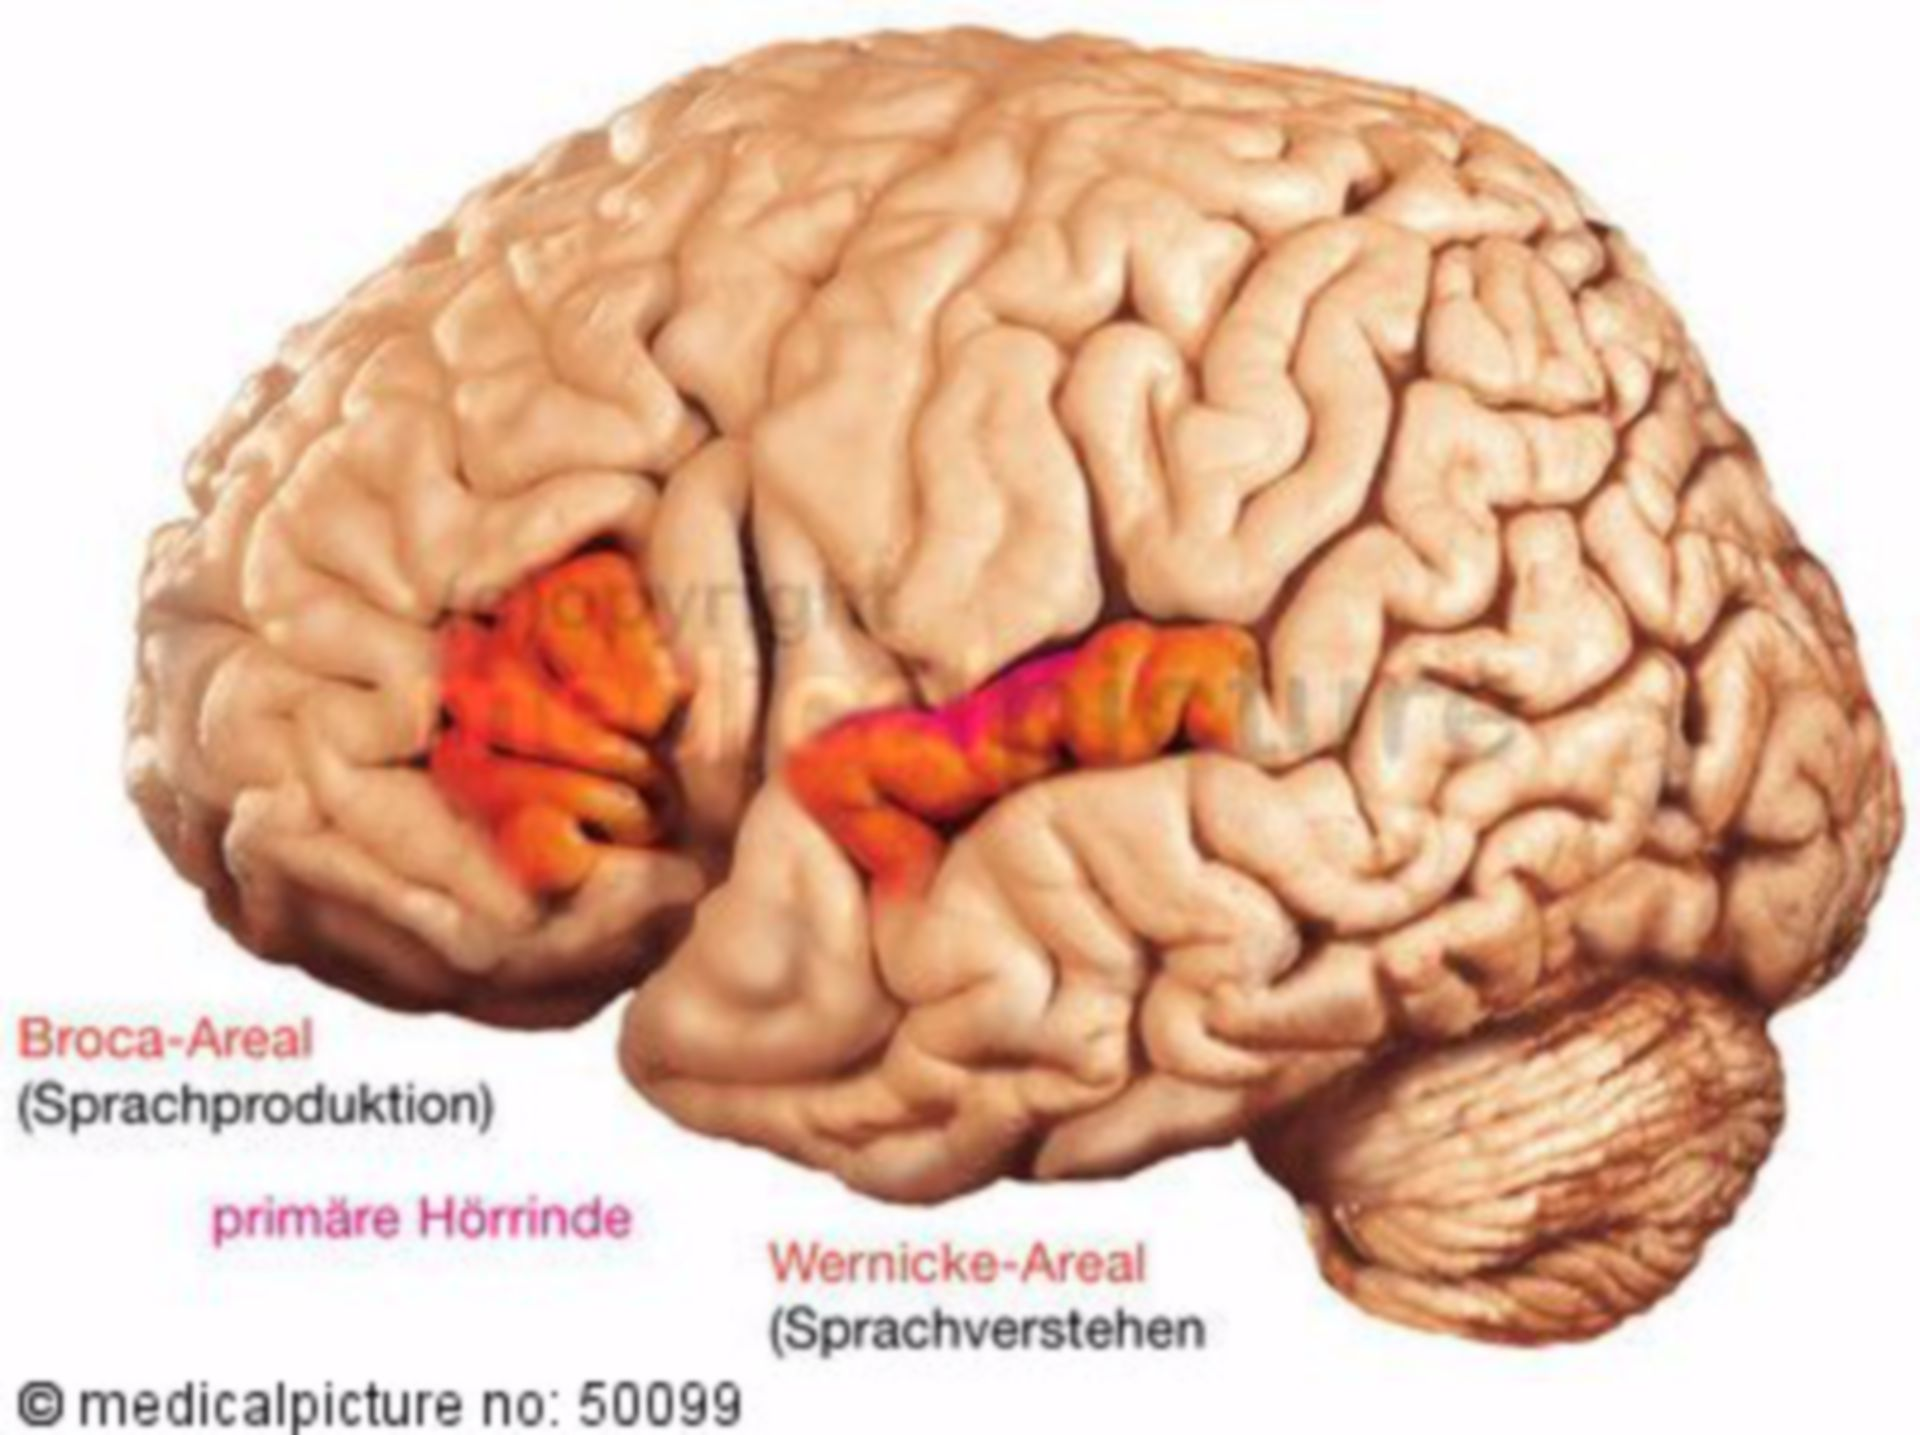 Speech centers of the brain